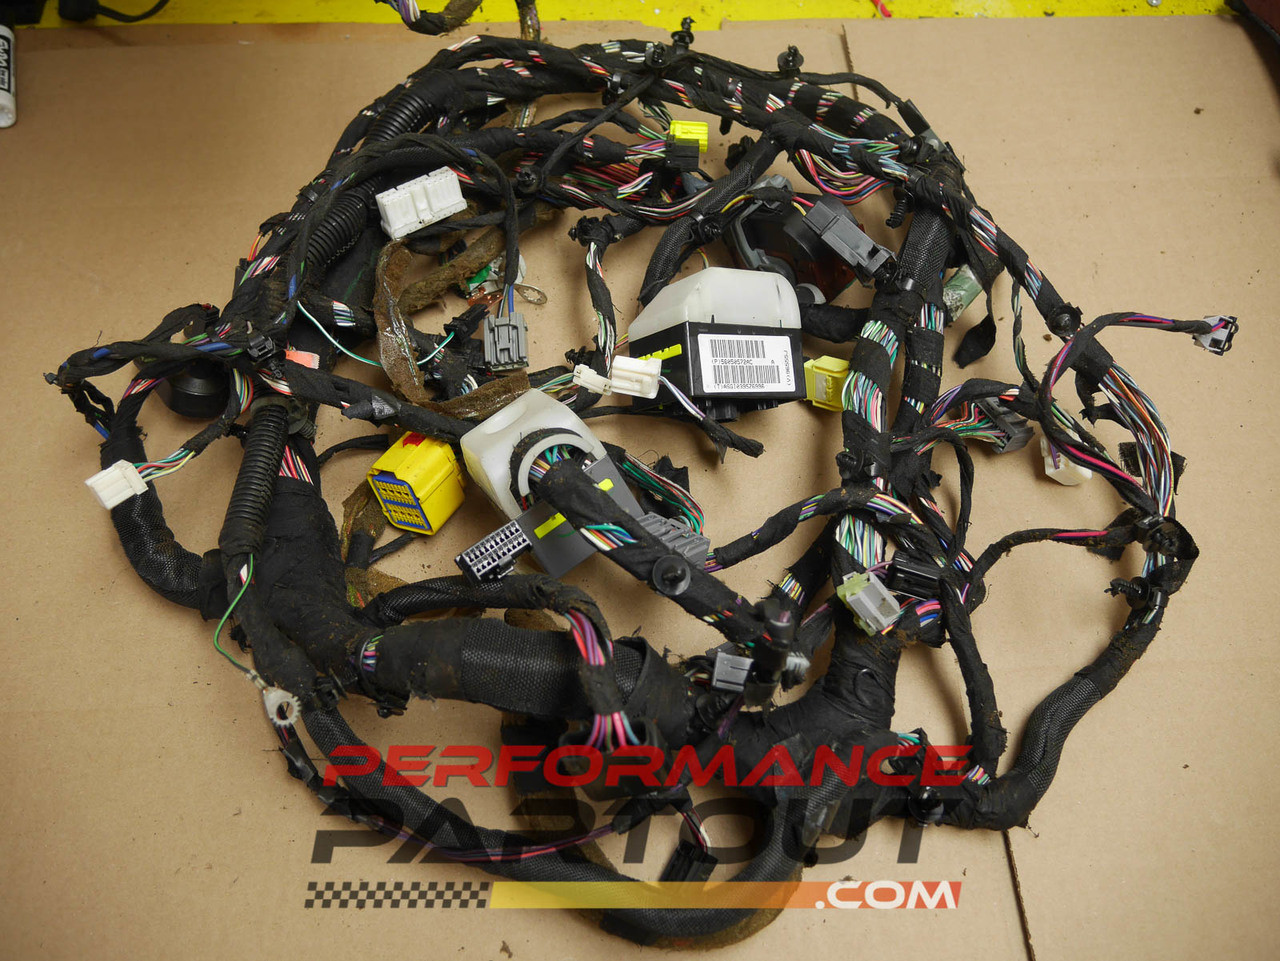 under dash wiring harness jeep grand cherokee 56050572acunder dash wiring harness jeep grand cherokee 56050572ac performance [ 1280 x 961 Pixel ]